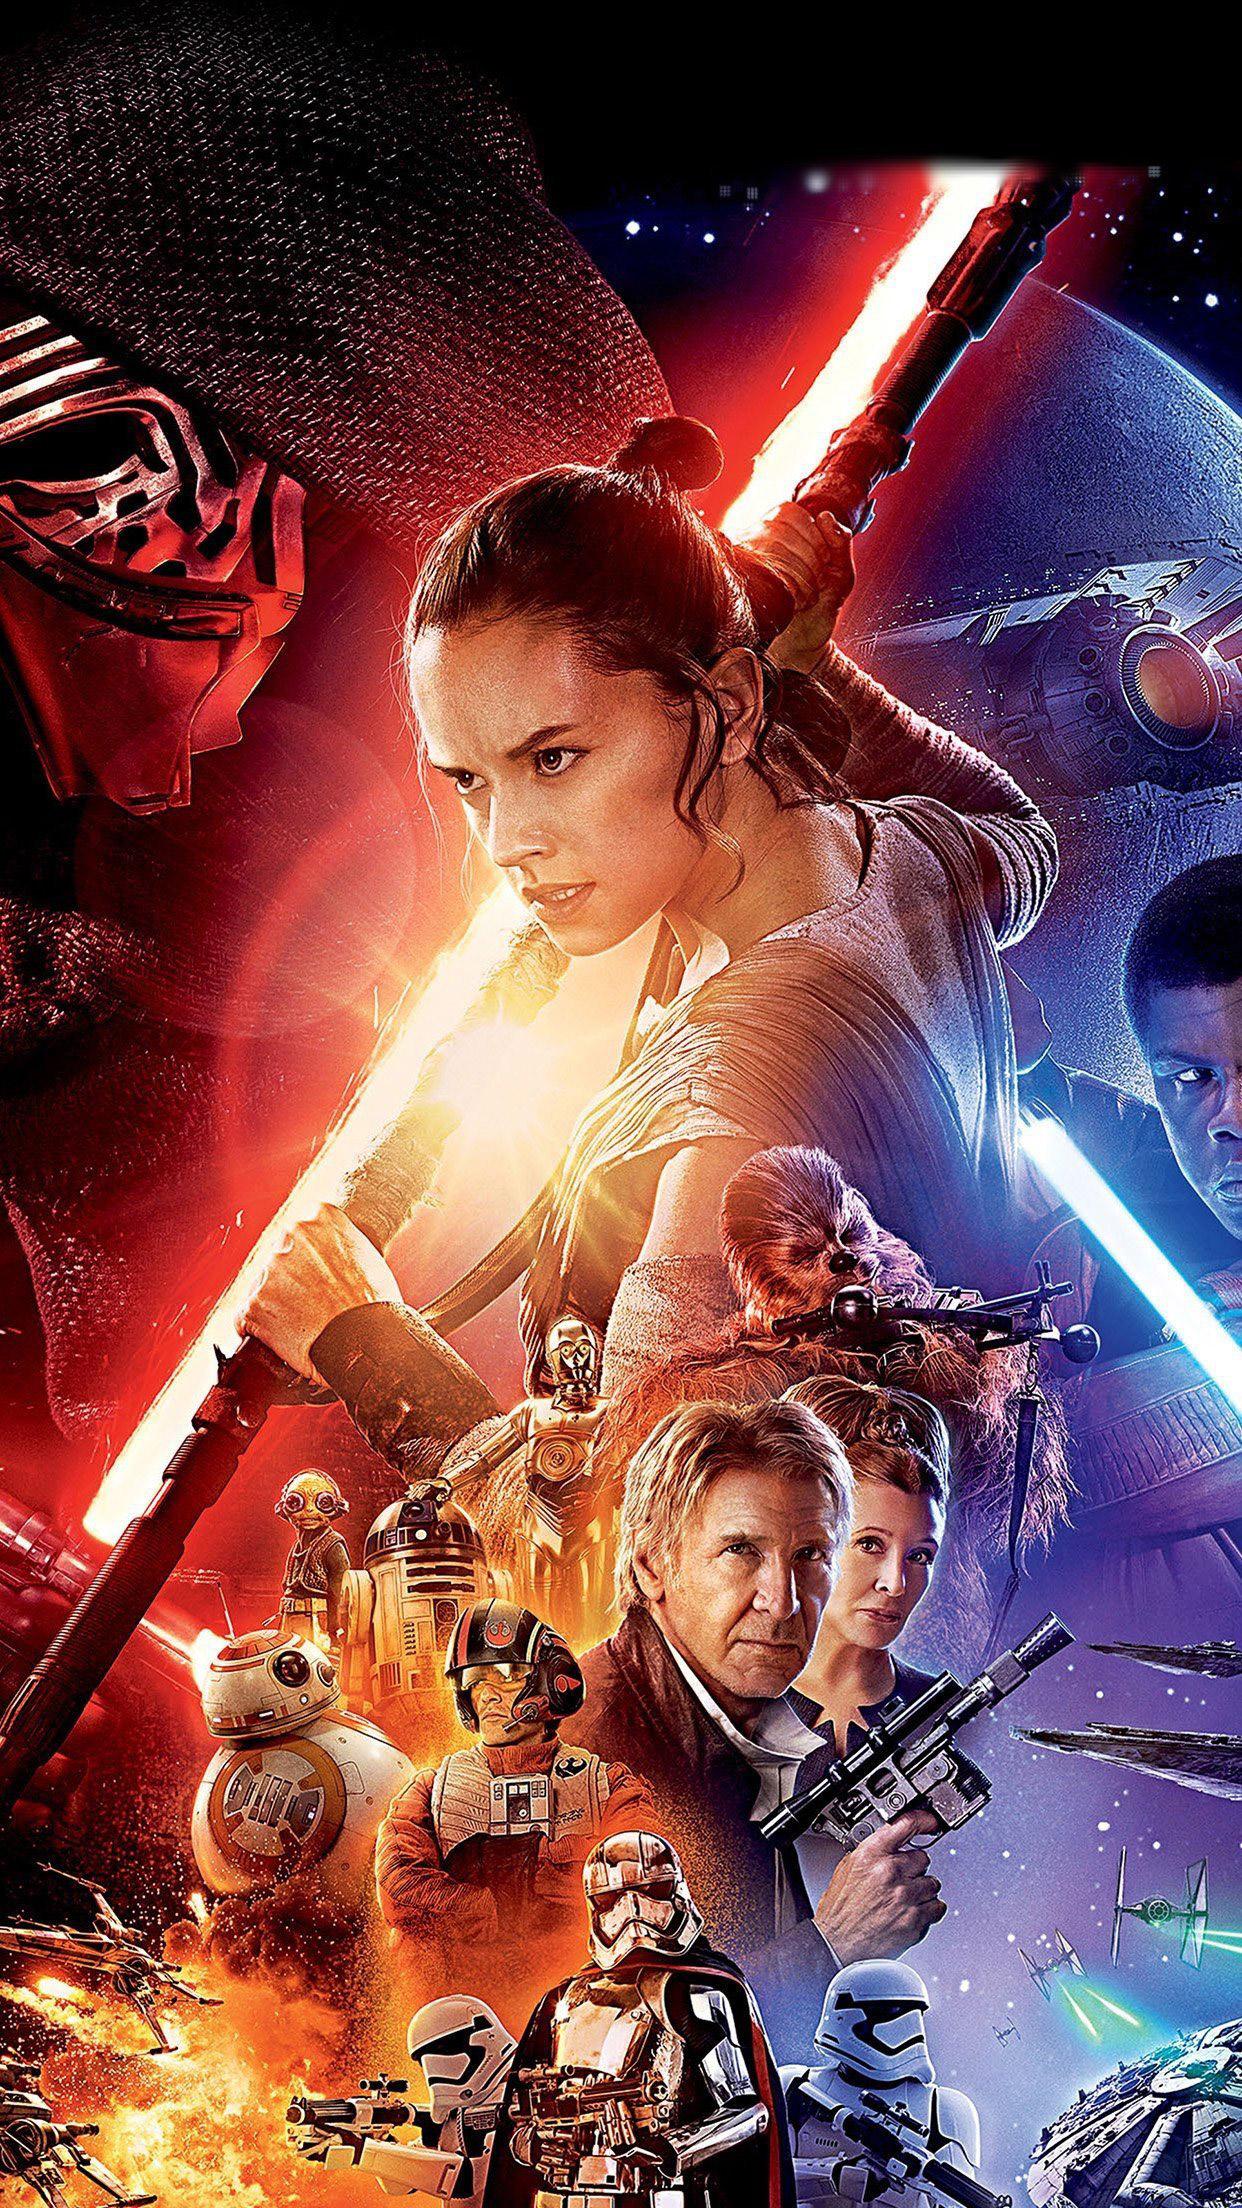 Star-Wars-The-Force-Awakens-original